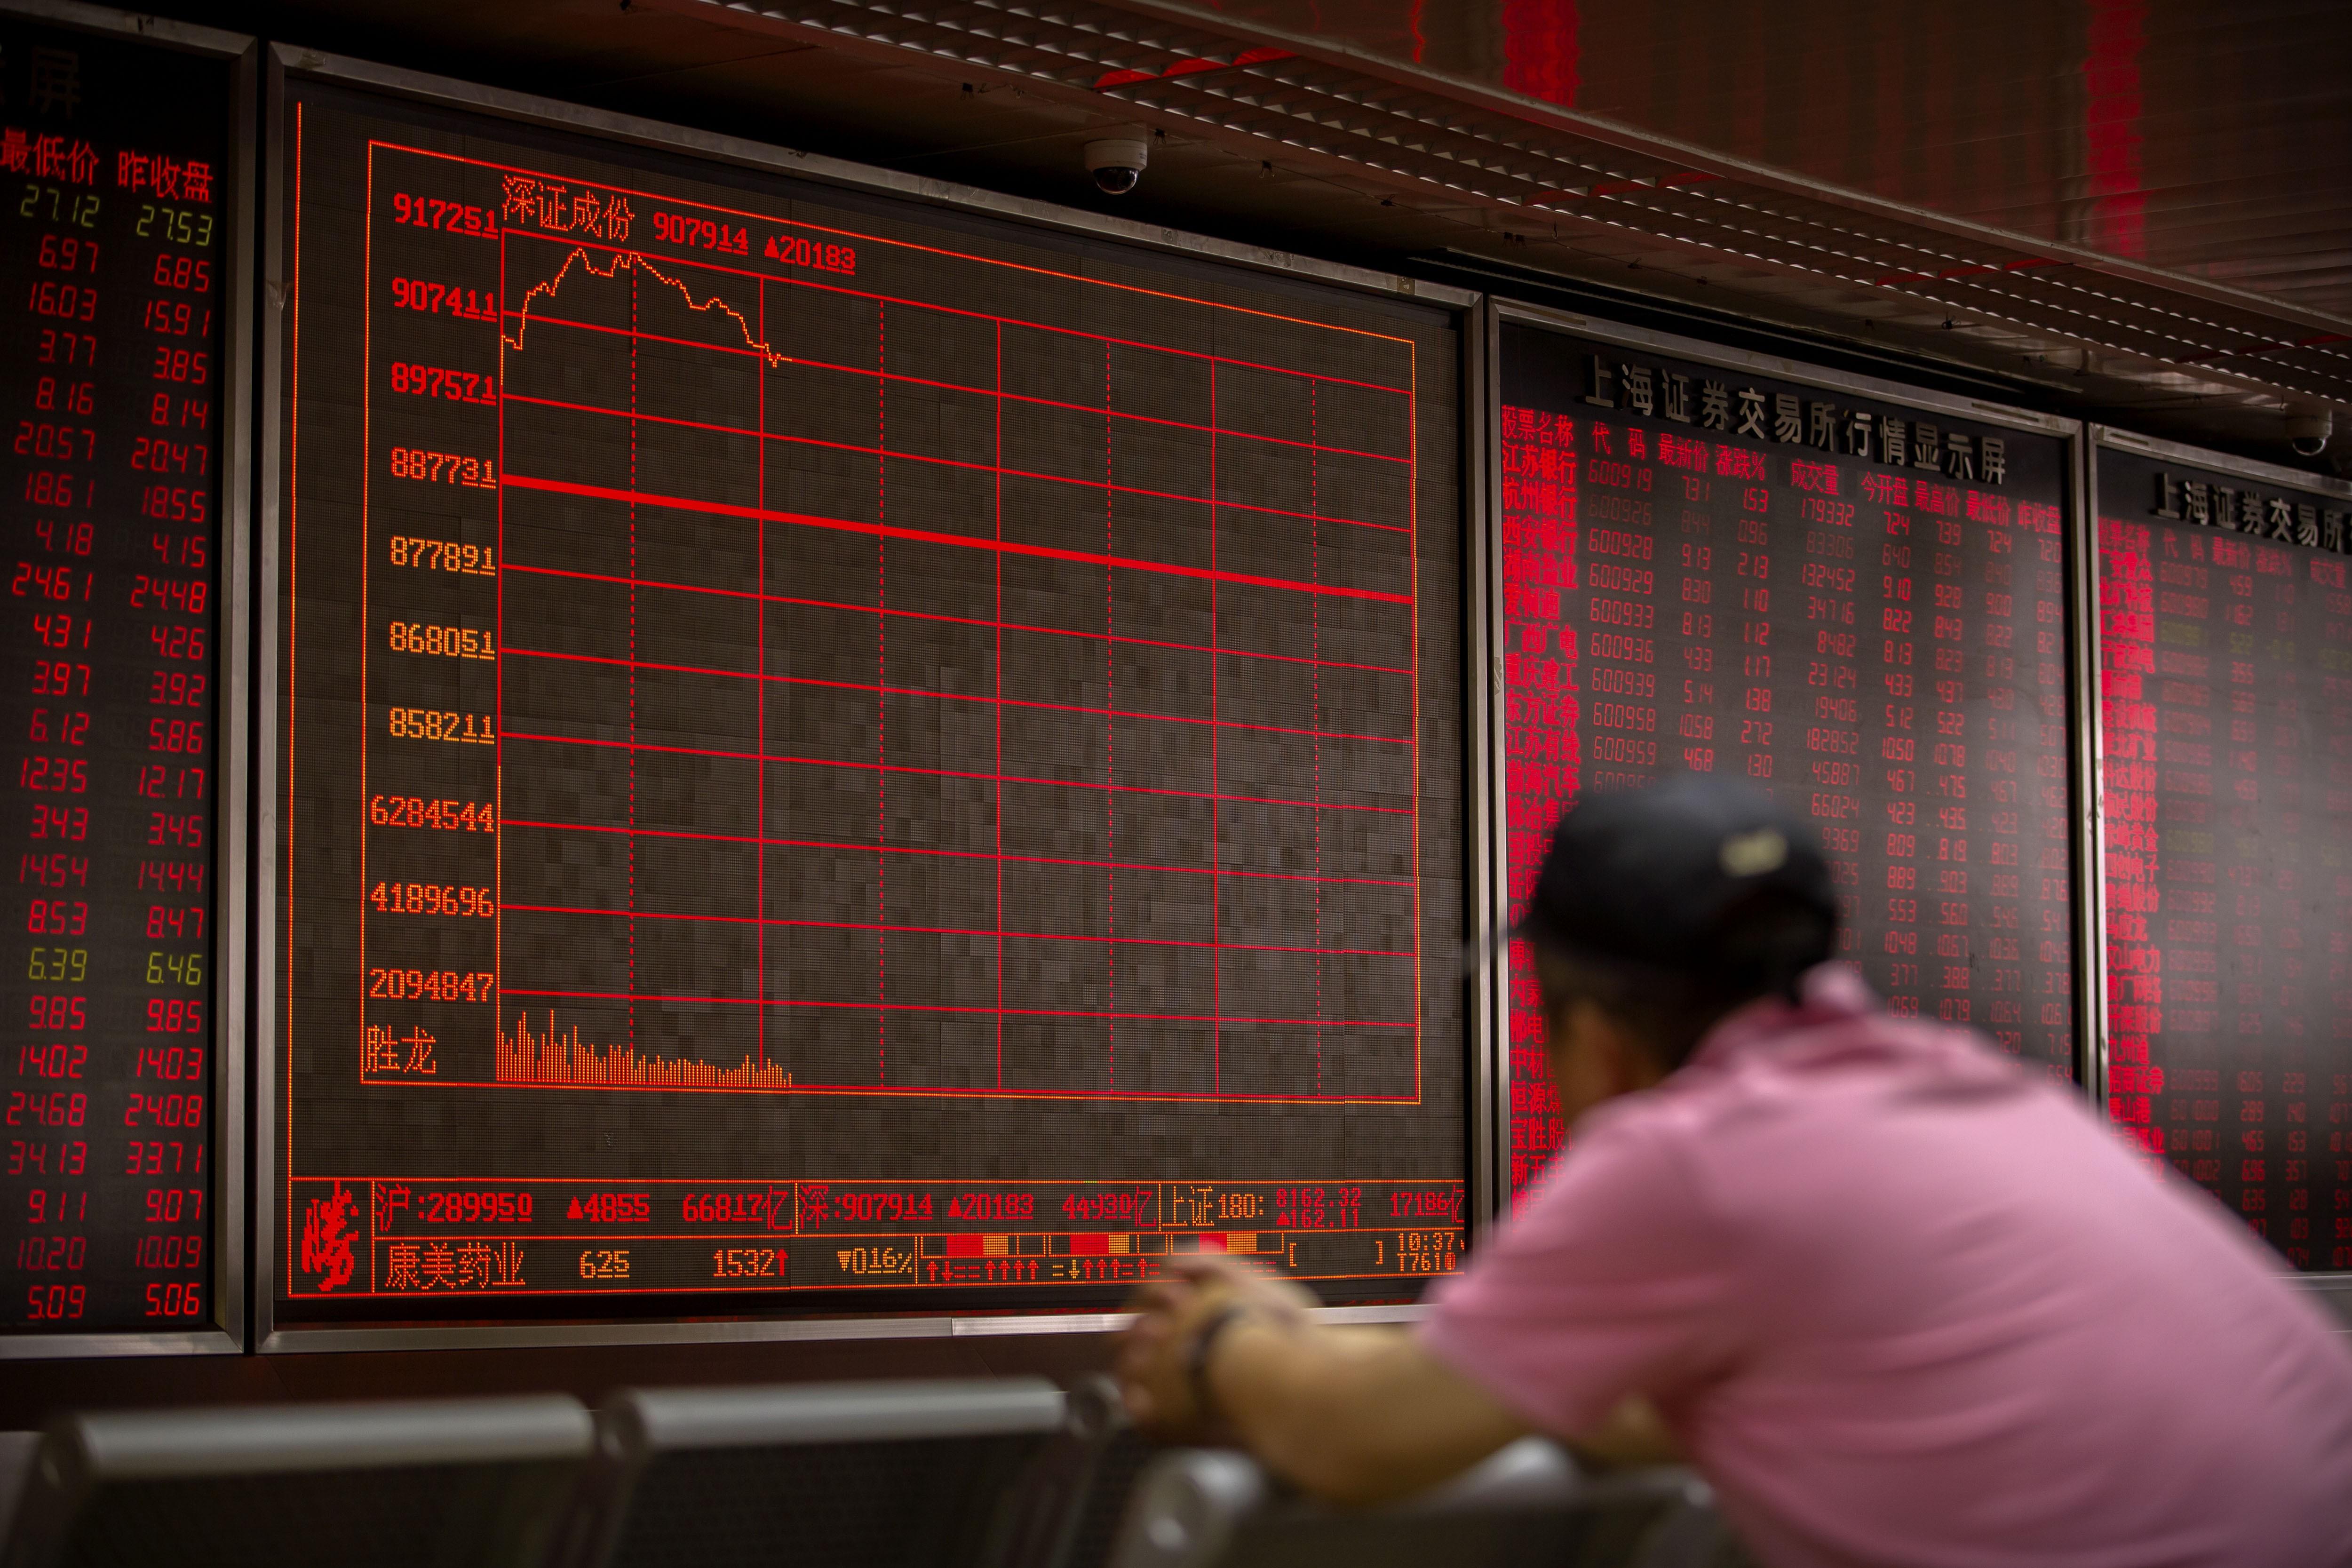 Shanghai ends seven-day losing streak while Hang Seng Index falls on